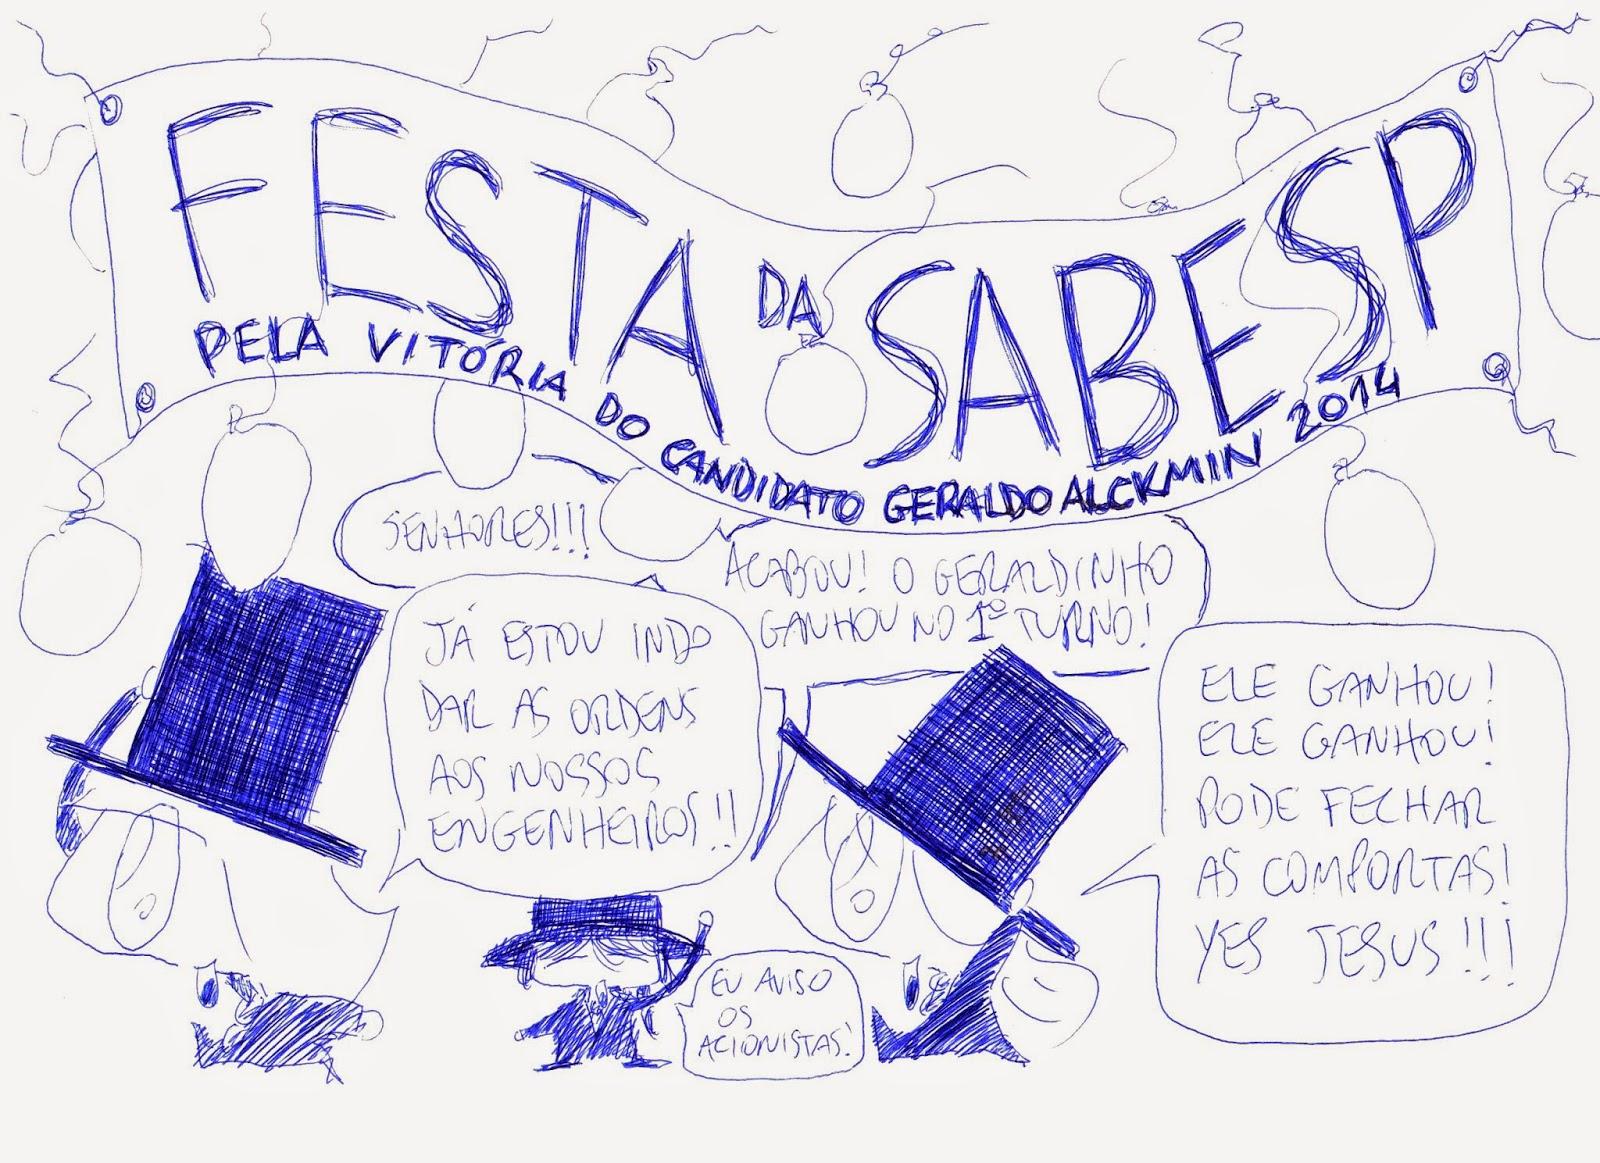 http://virgenskamikazes.blogspot.com.br/2014/10/festa-na-sabesp.html